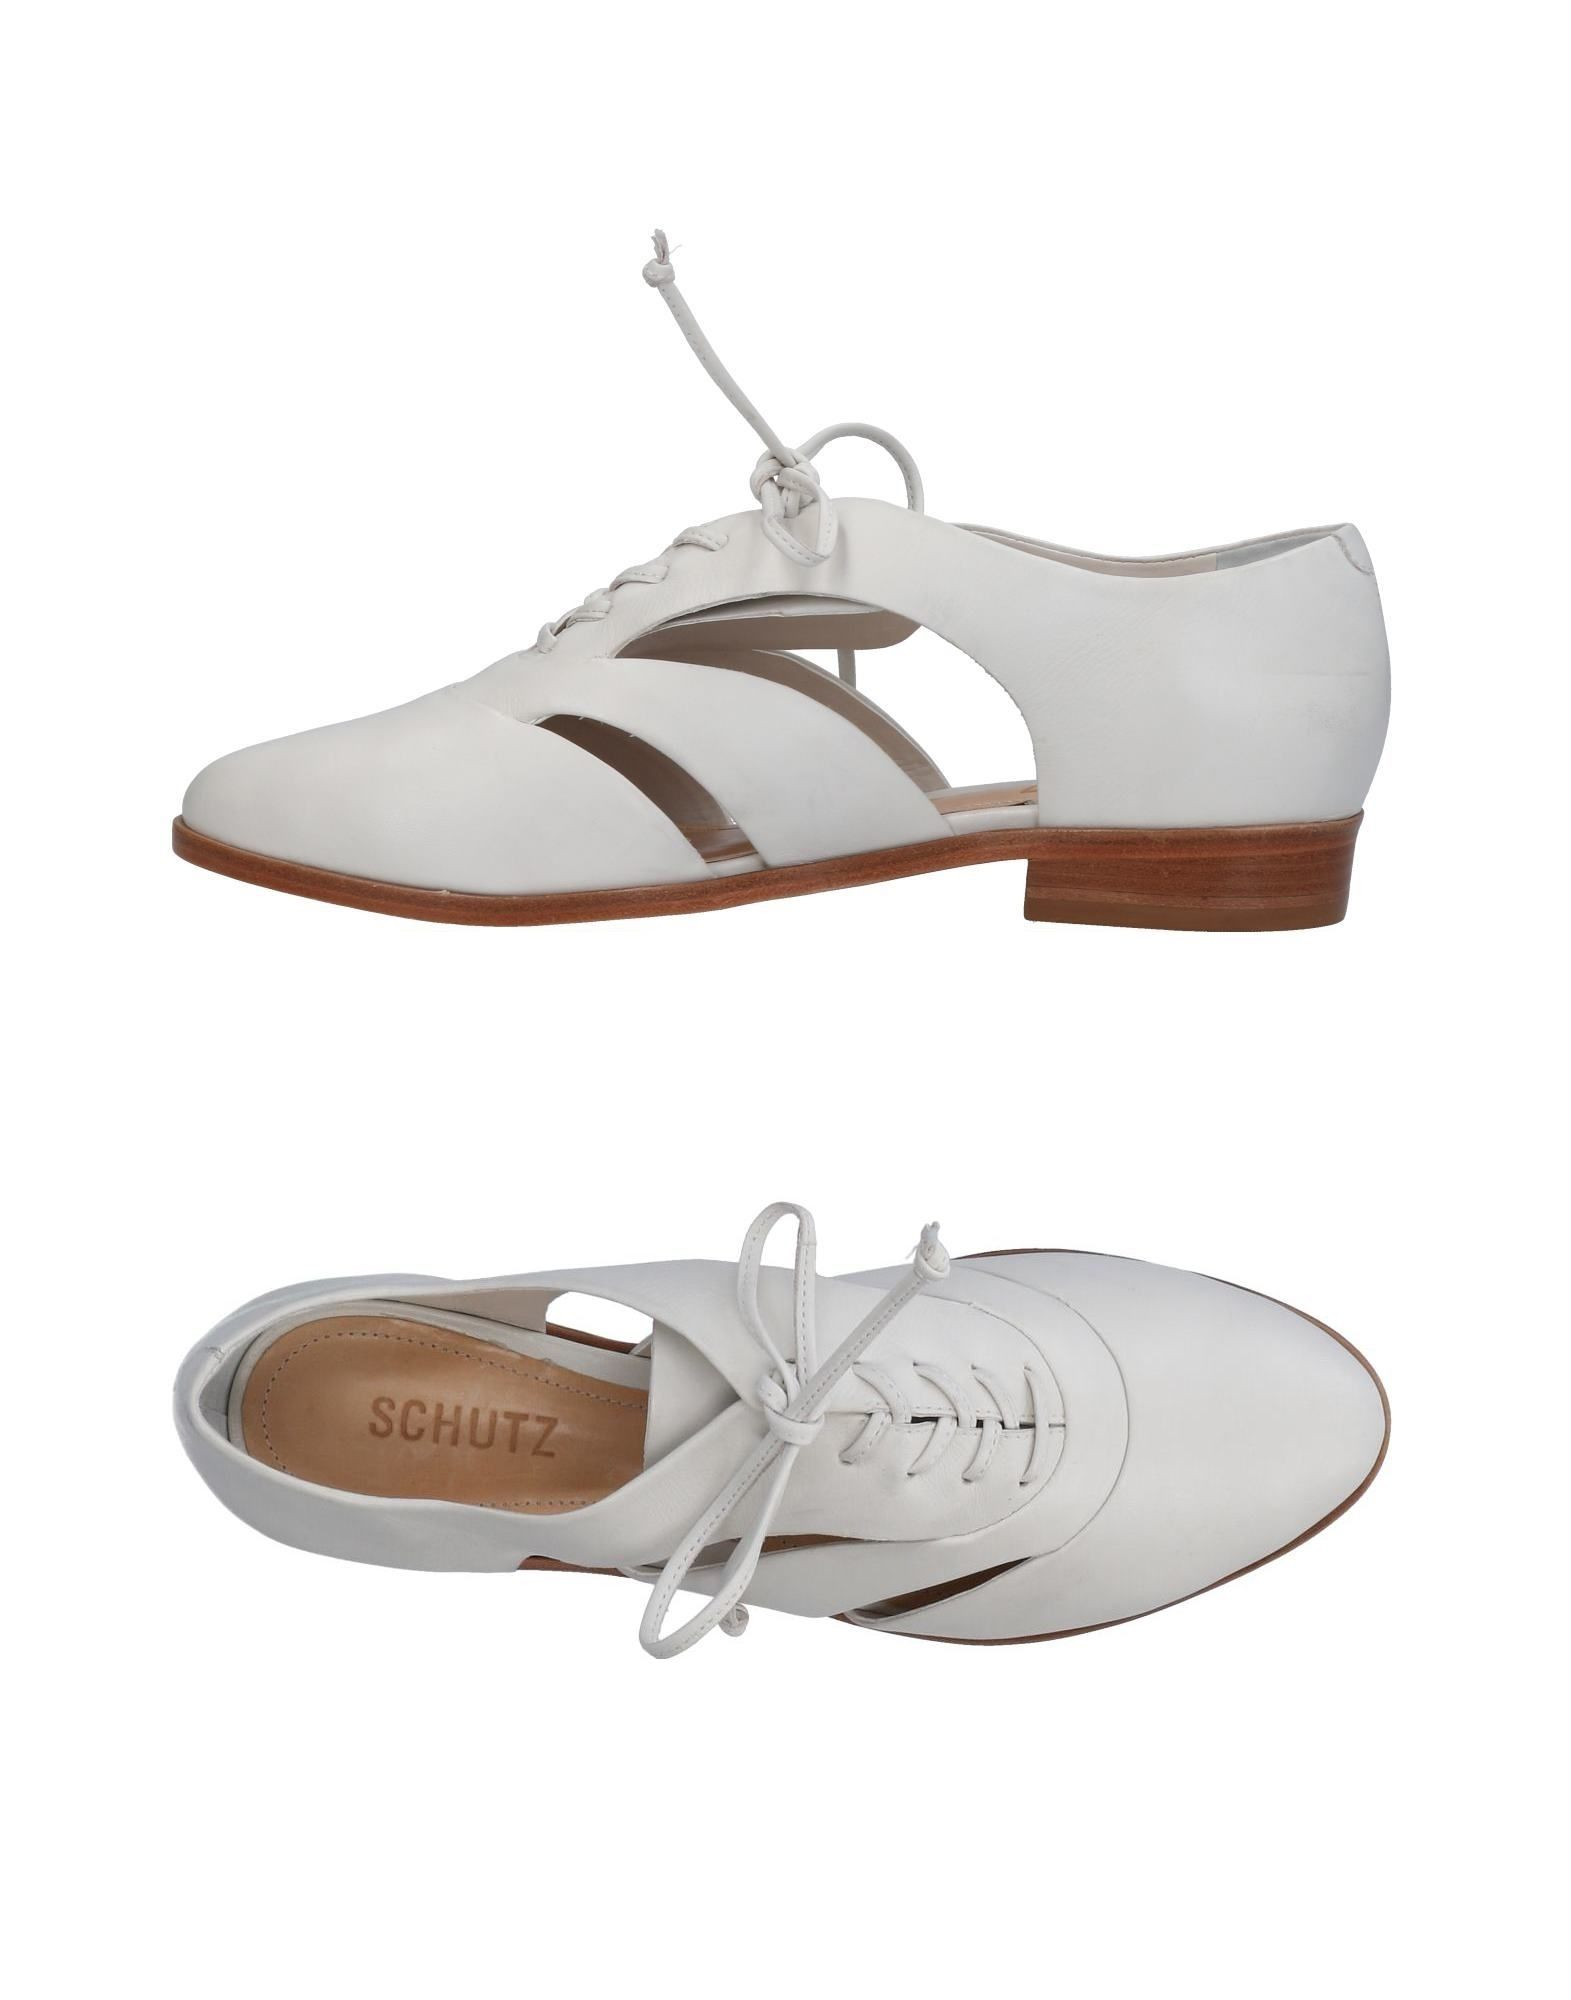 Schutz Schnürschuhe Damen  11457771VA Gute Qualität beliebte Schuhe